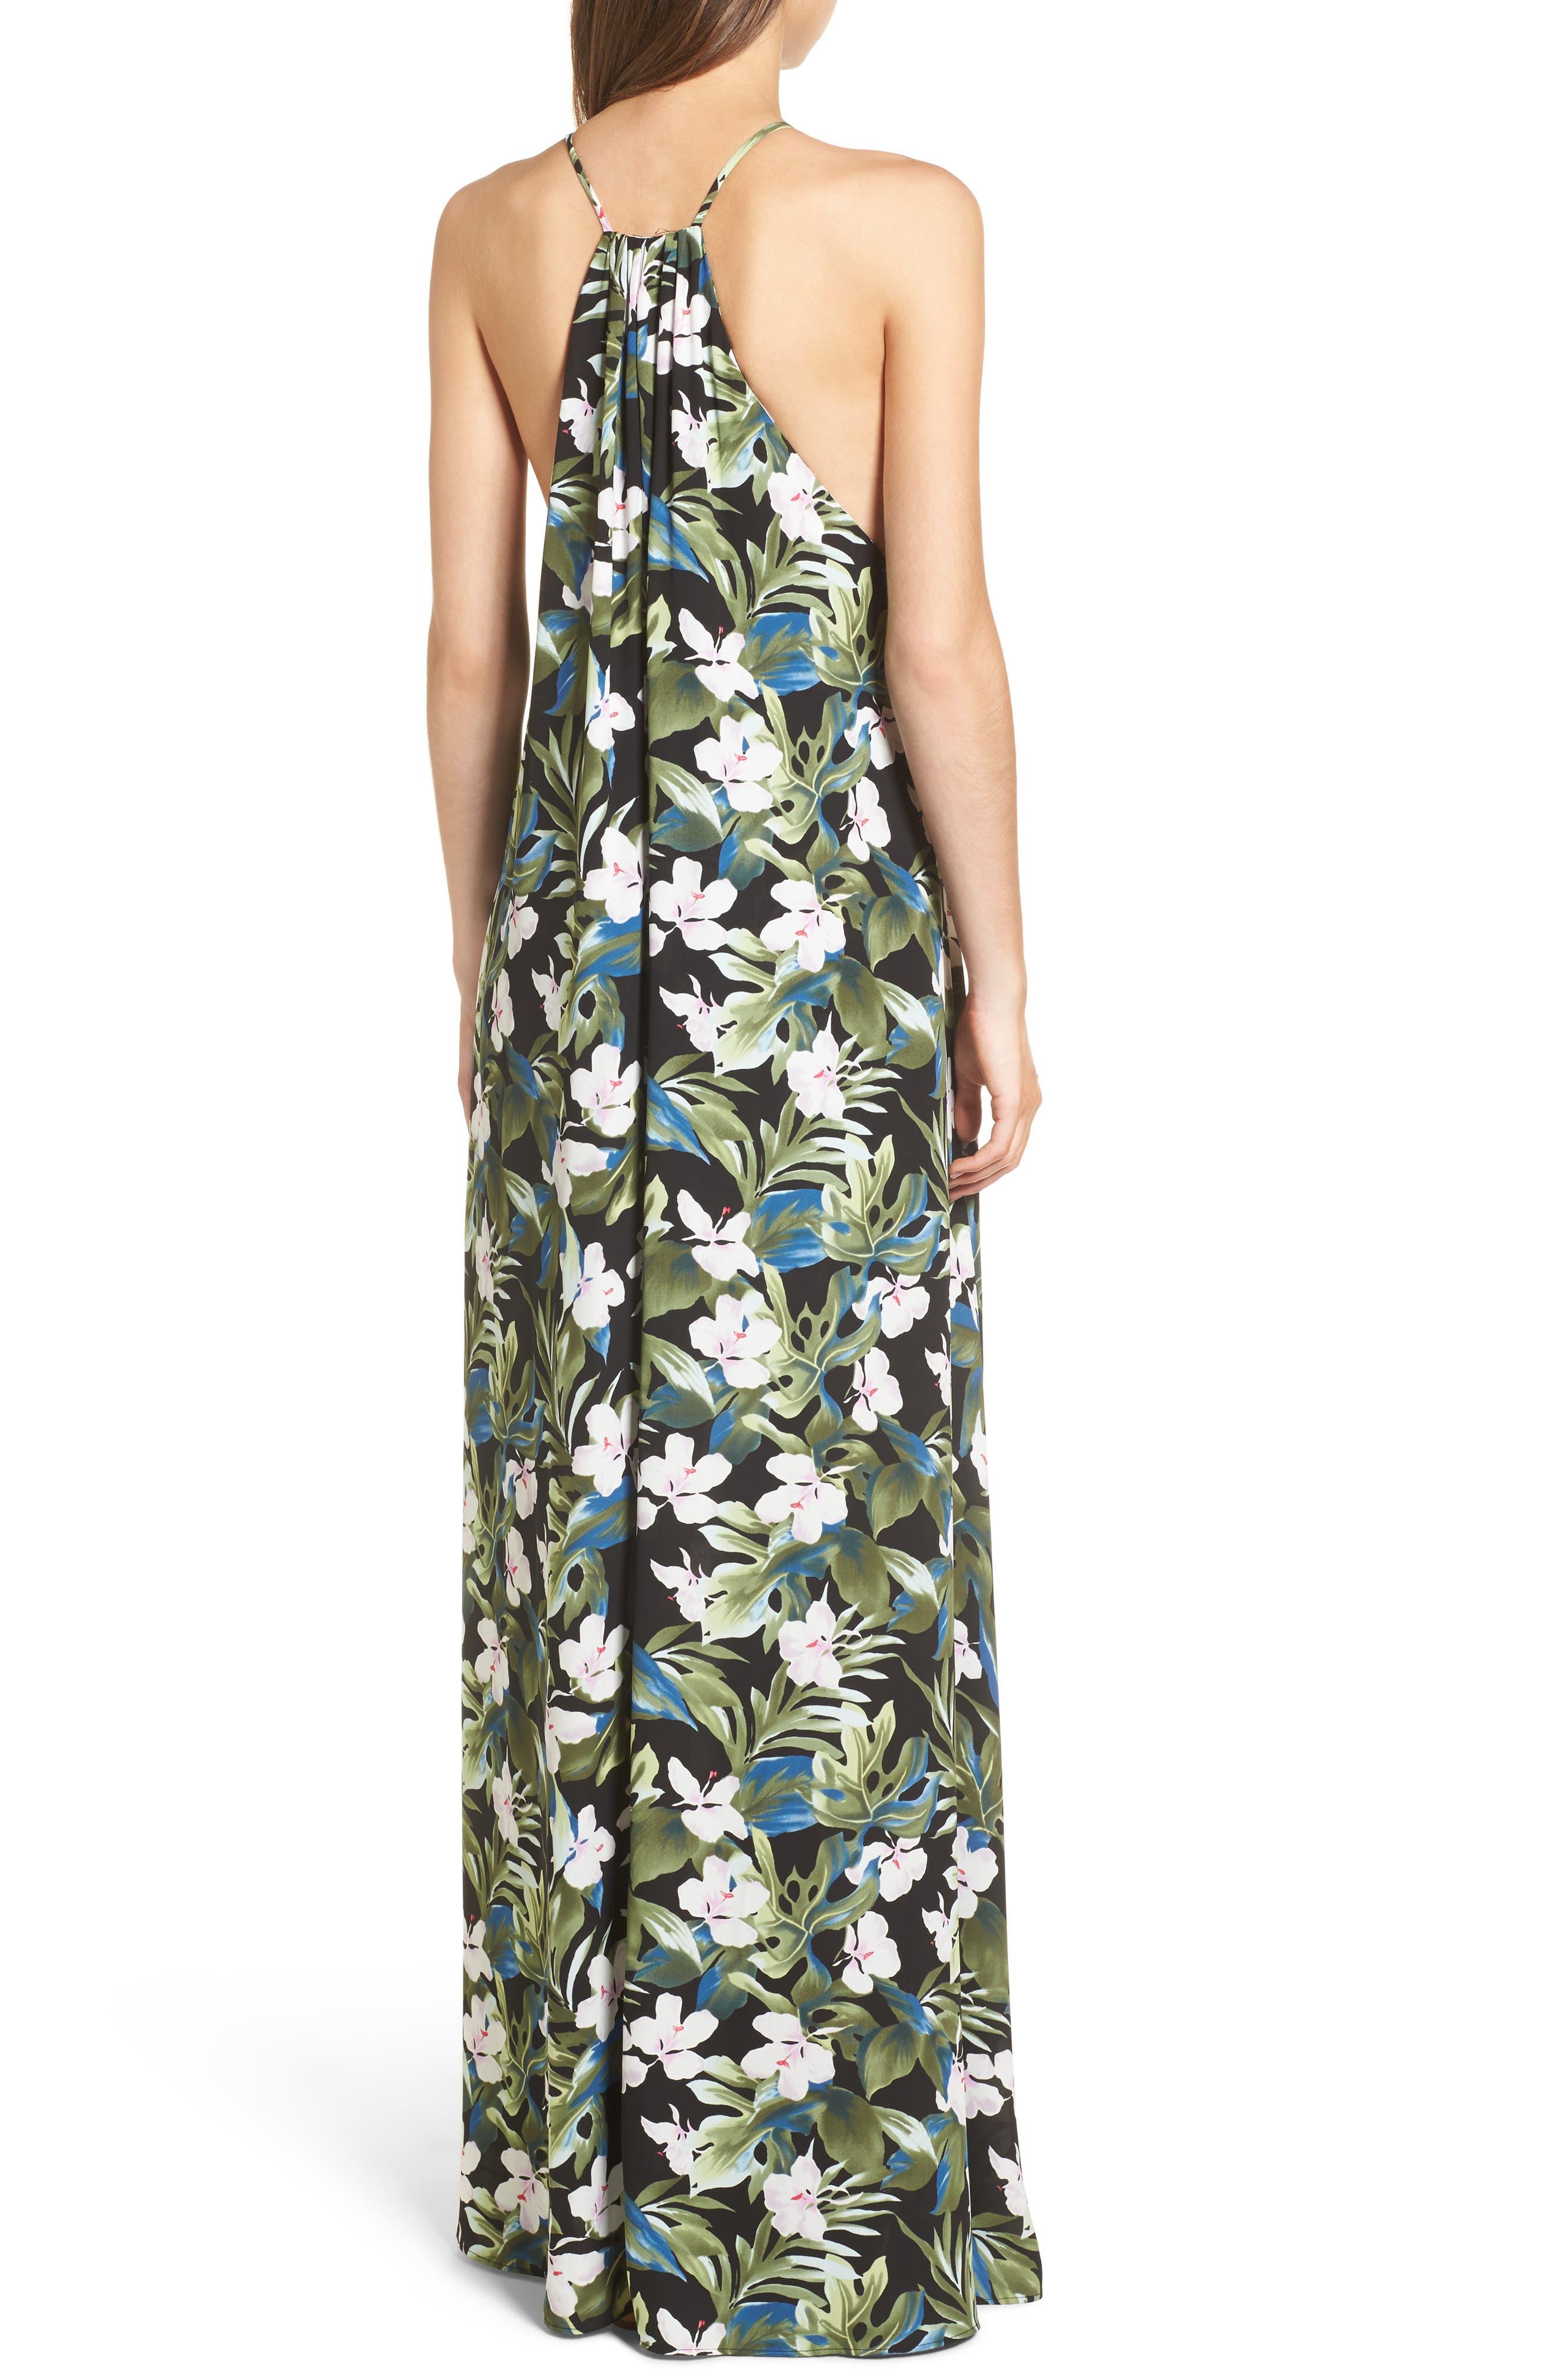 Bronte Maxi Dress,                             Alternate thumbnail 2, color,                             Monet On Vacay